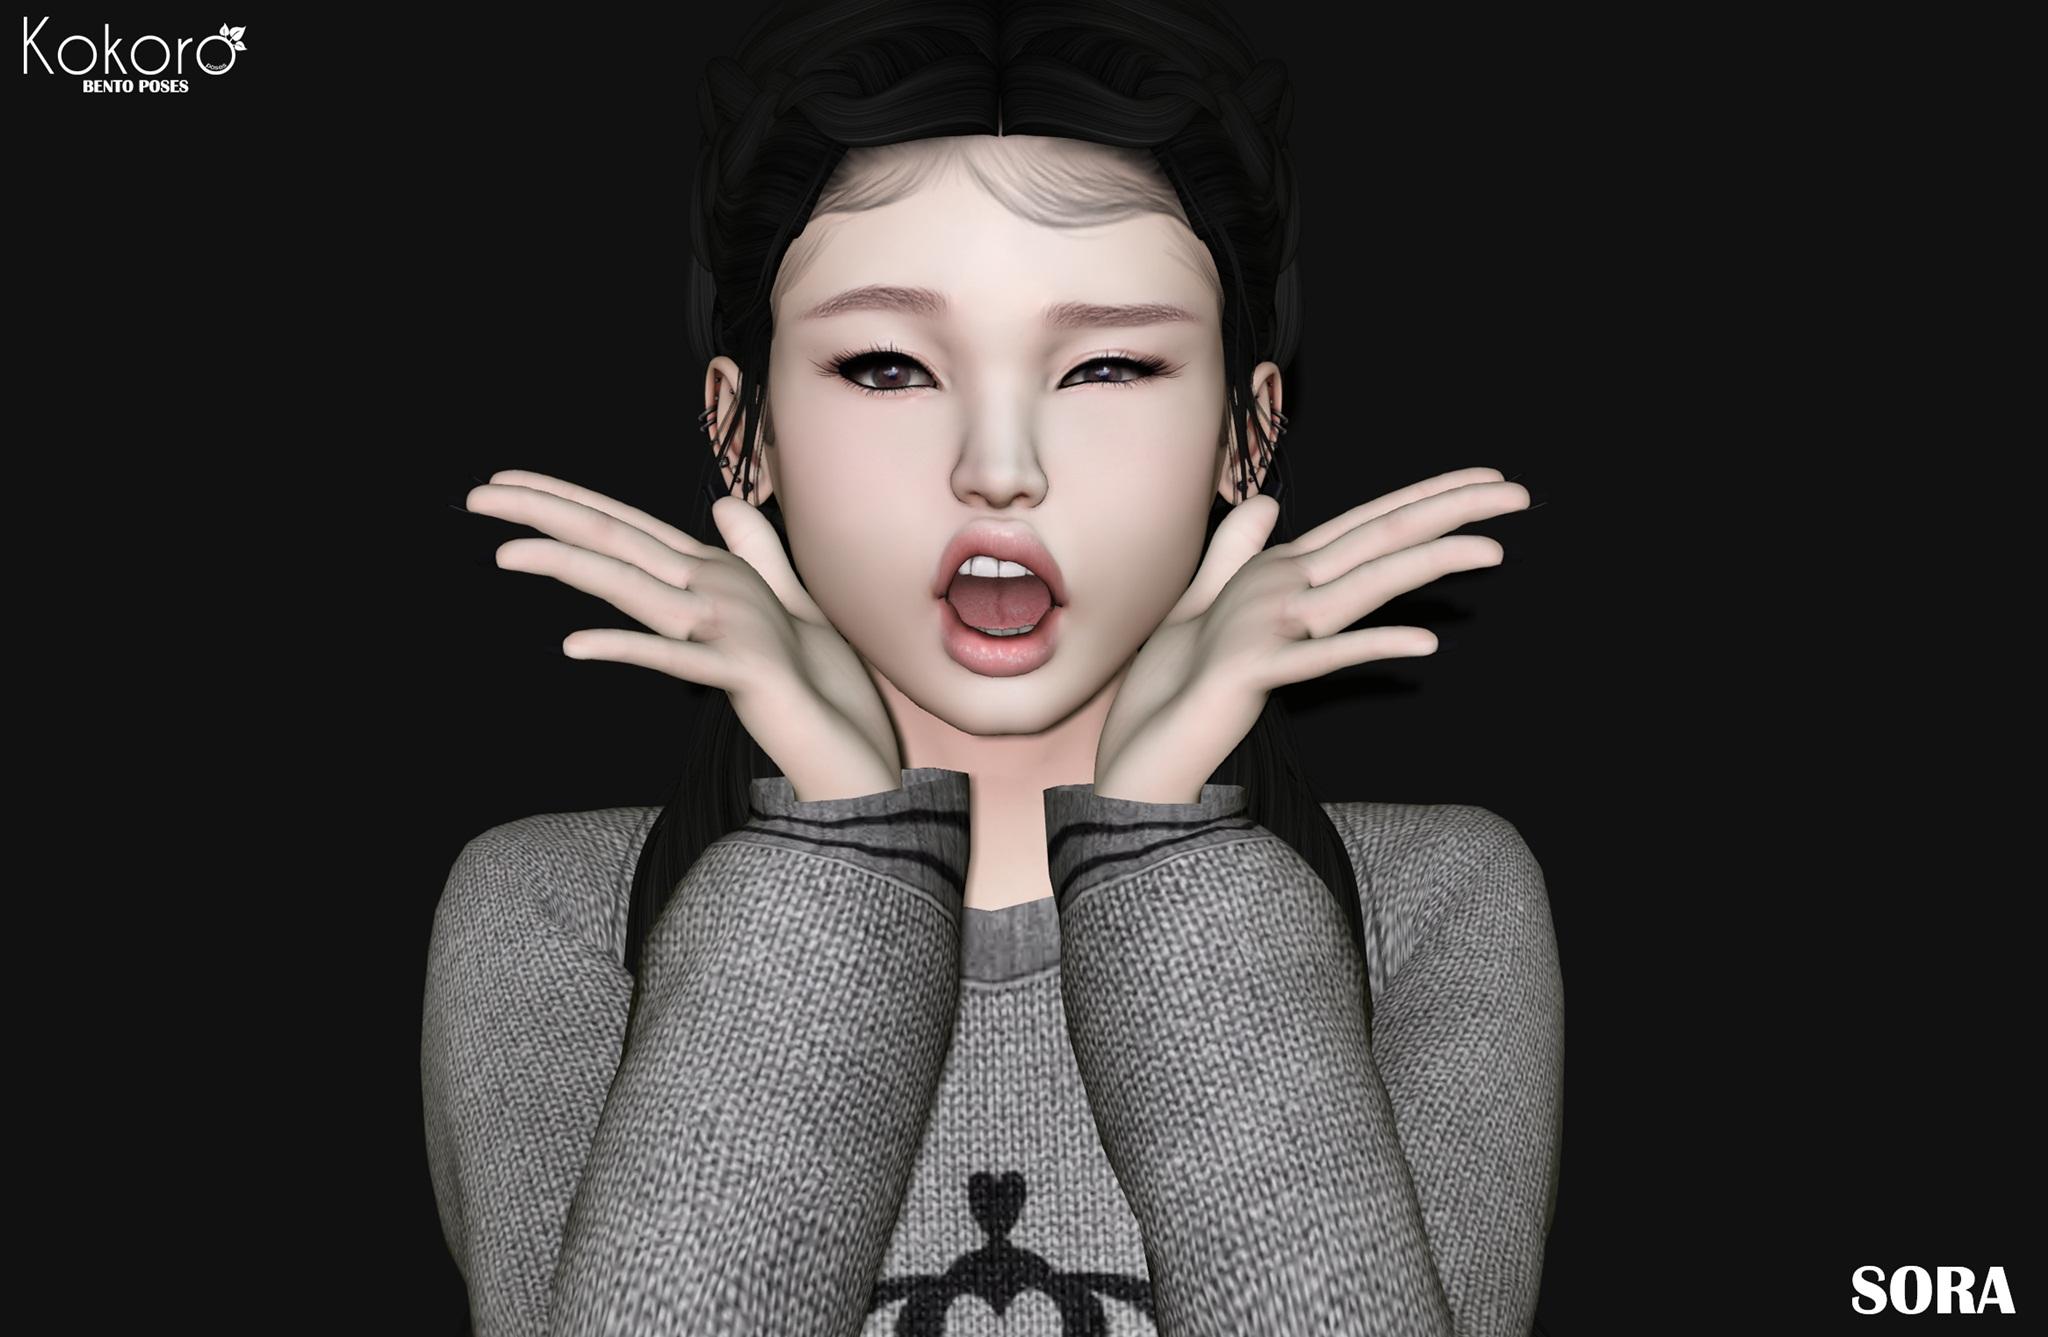 Kokoro Poses - Sora -GIFT.jpg